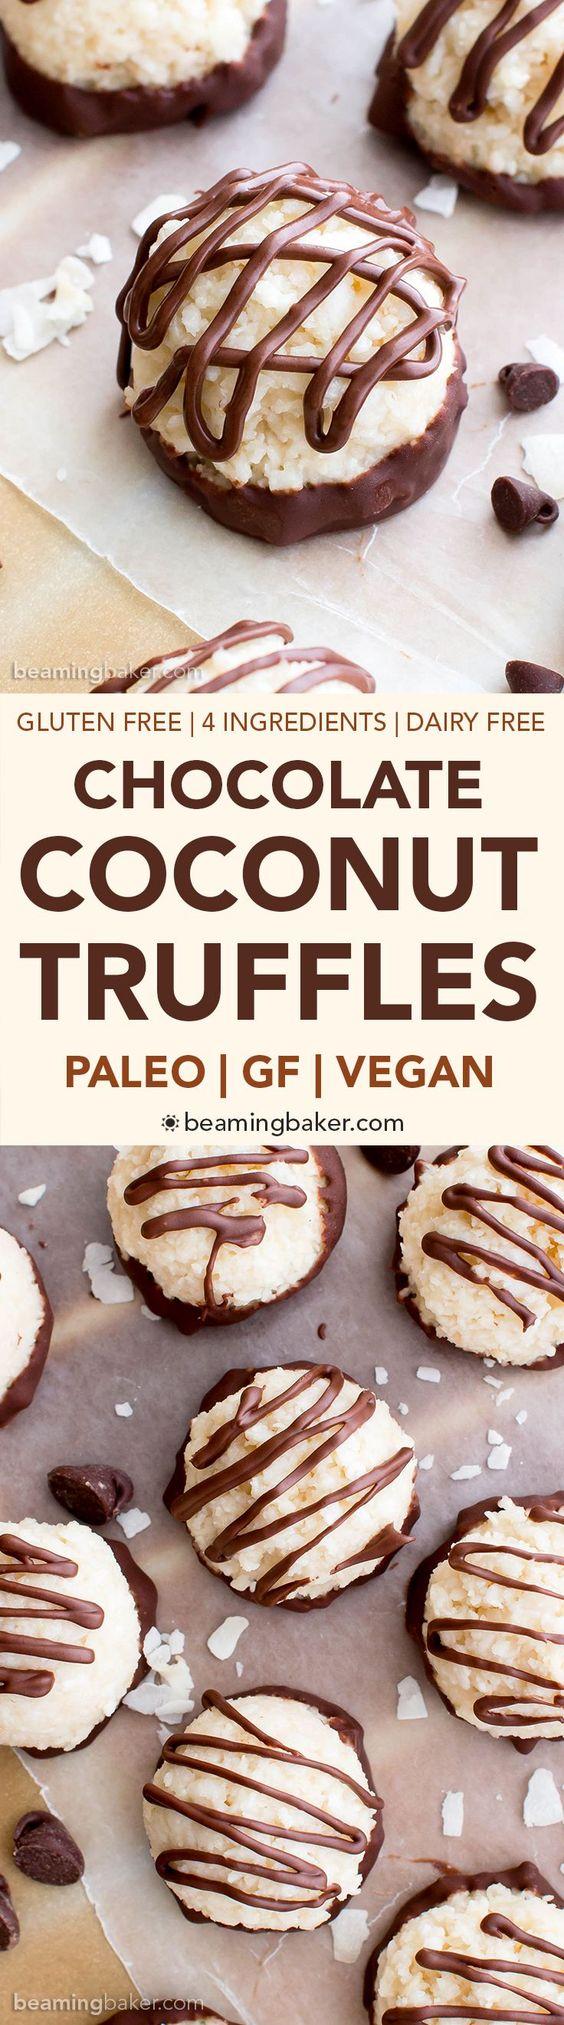 Paleo Vegan Chocolate Coconut Truffles (Gluten Free, Vegan, Paleo ...